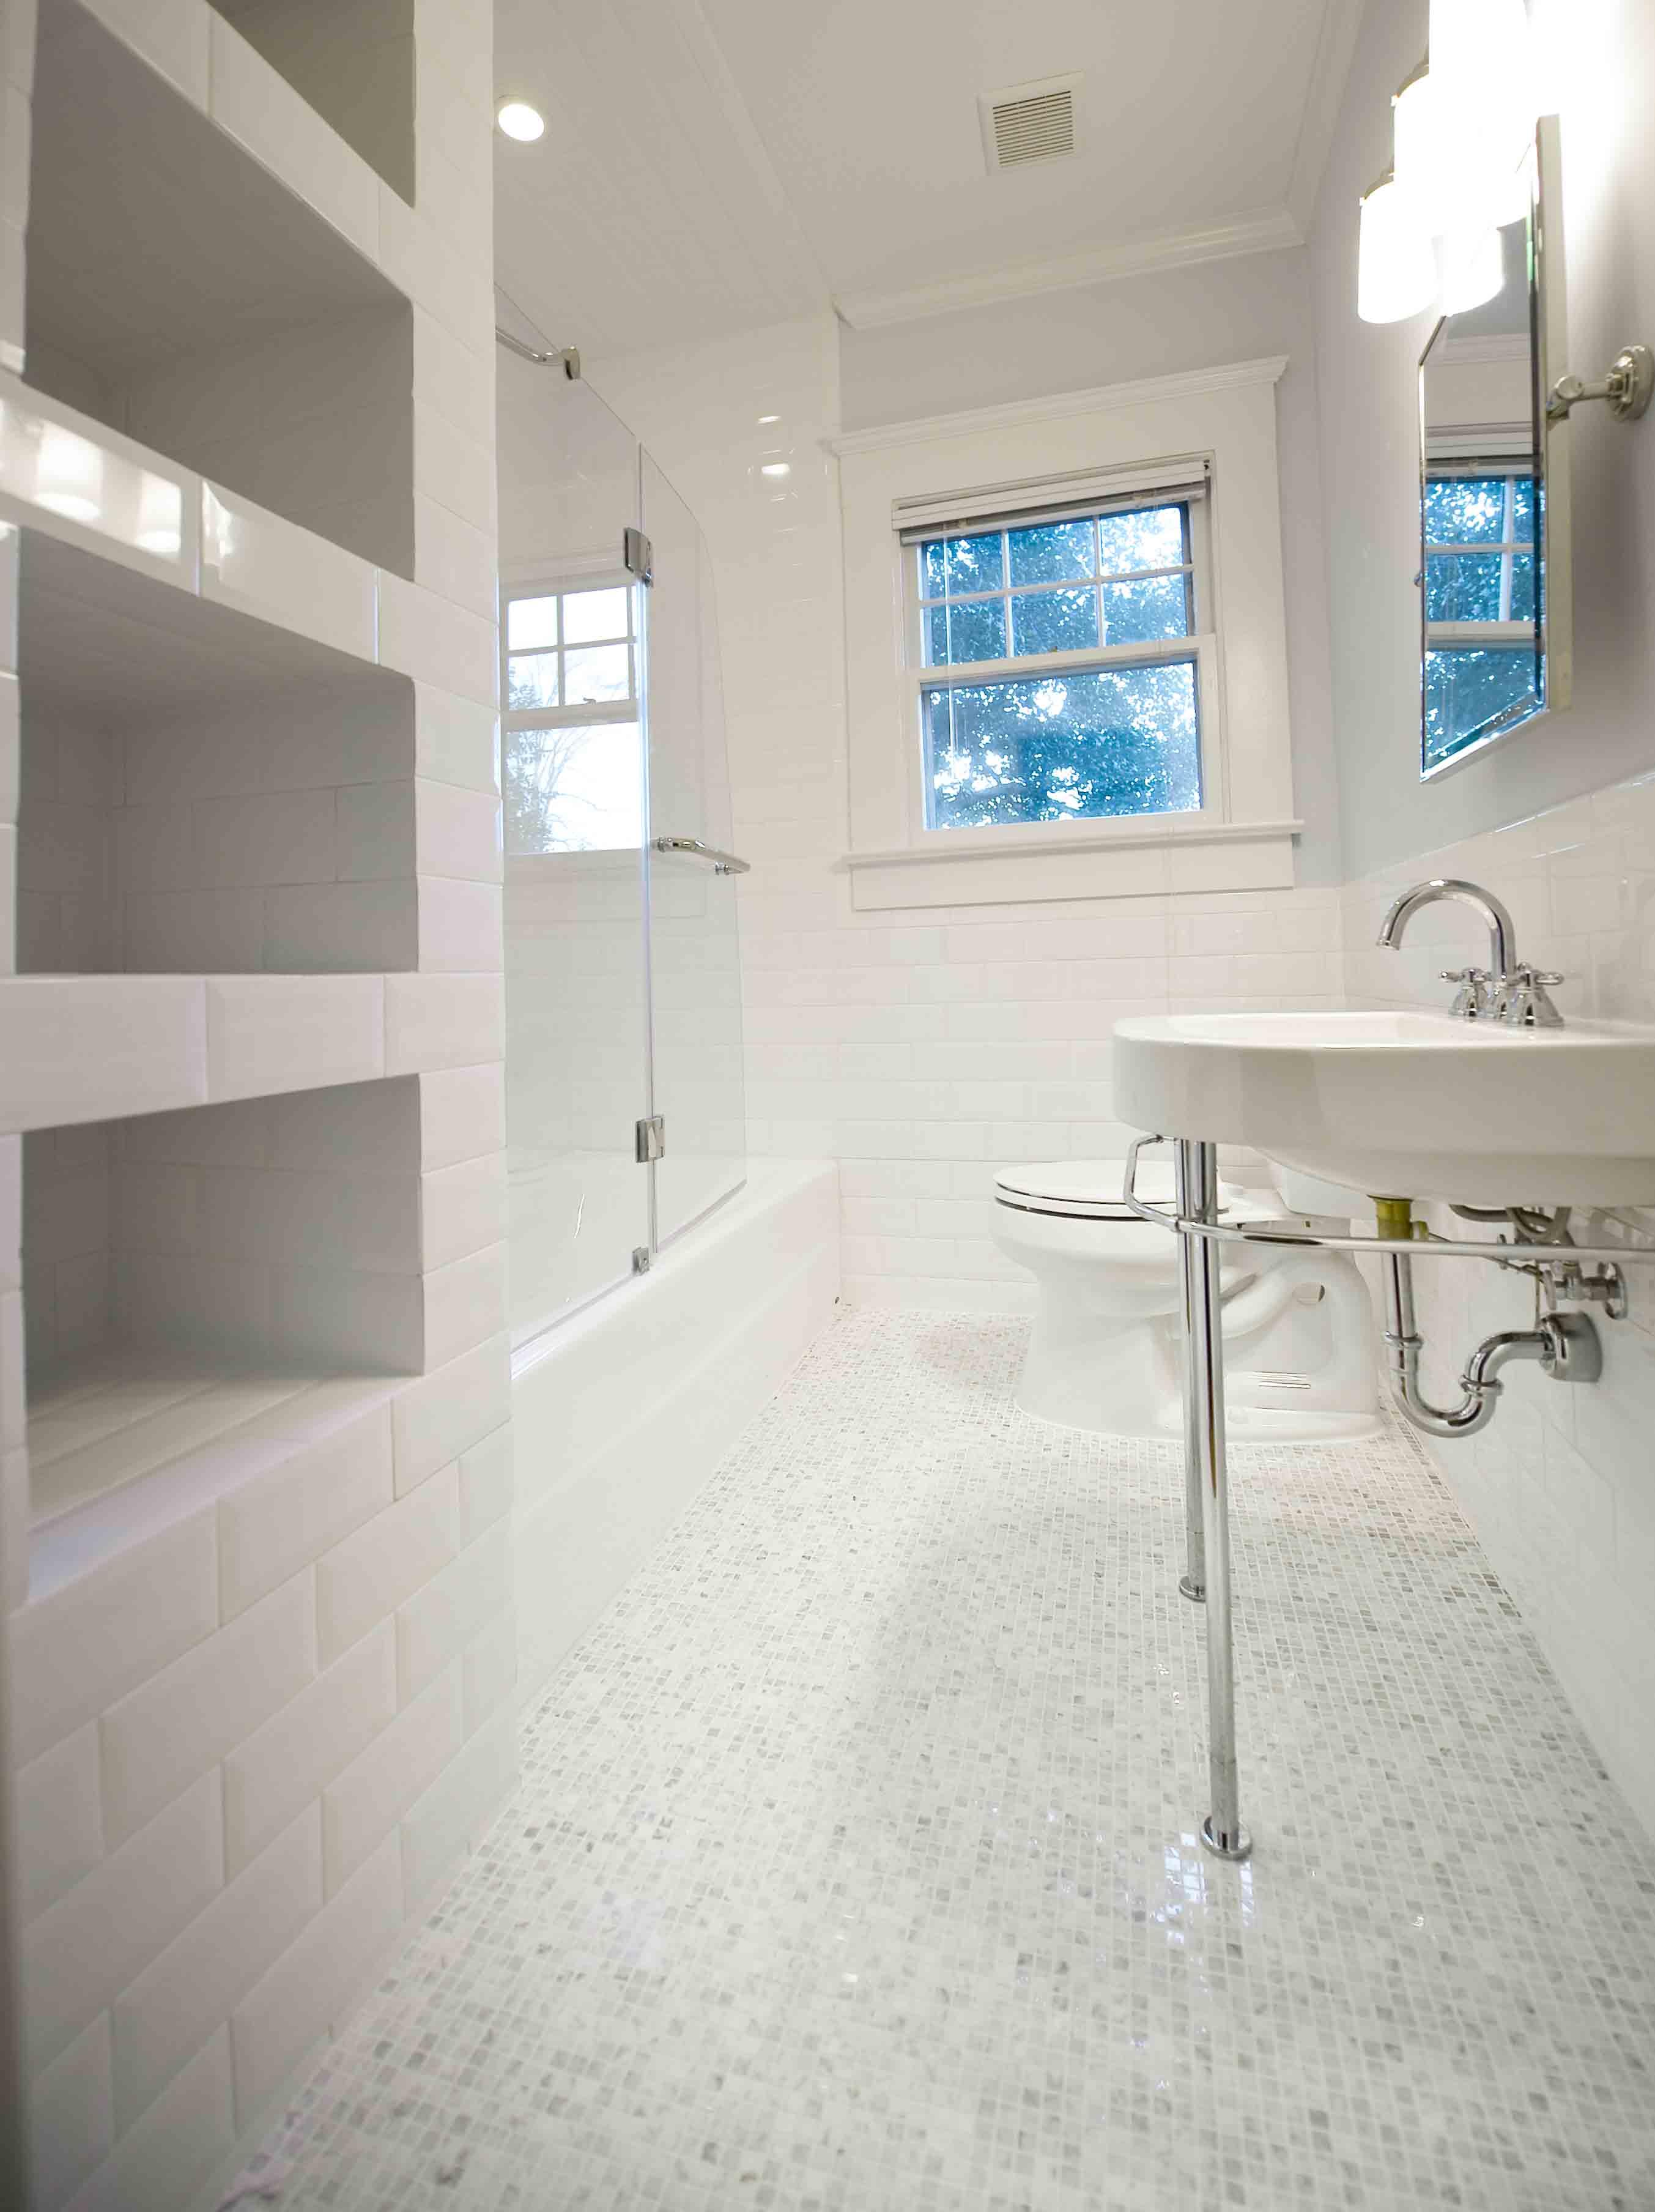 Heirloom Design Build Craftsman Bathroom Renovation ...